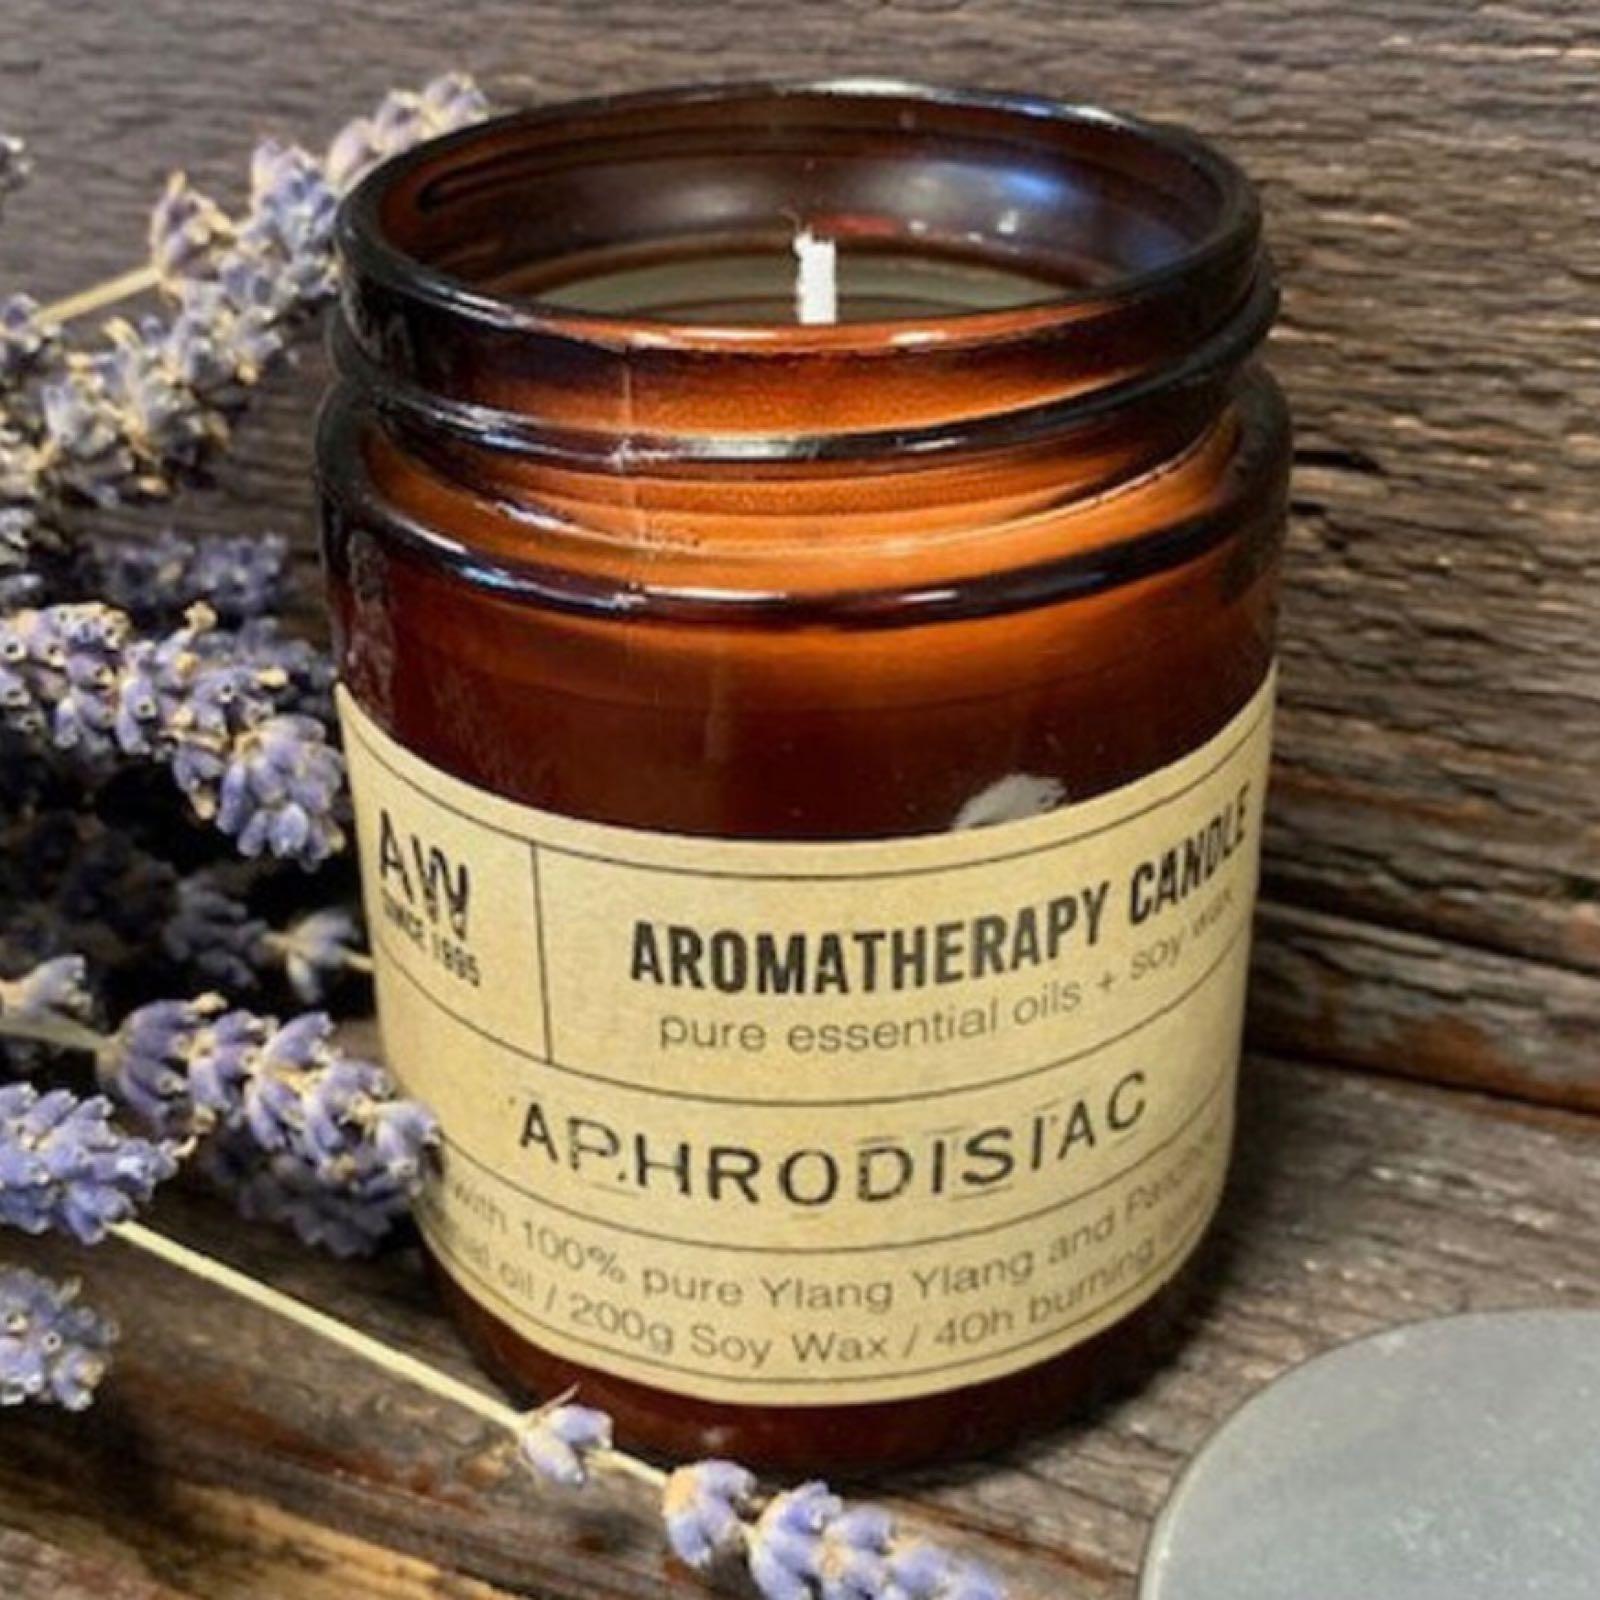 'Aphrodisiac' Aromatherapy Candle